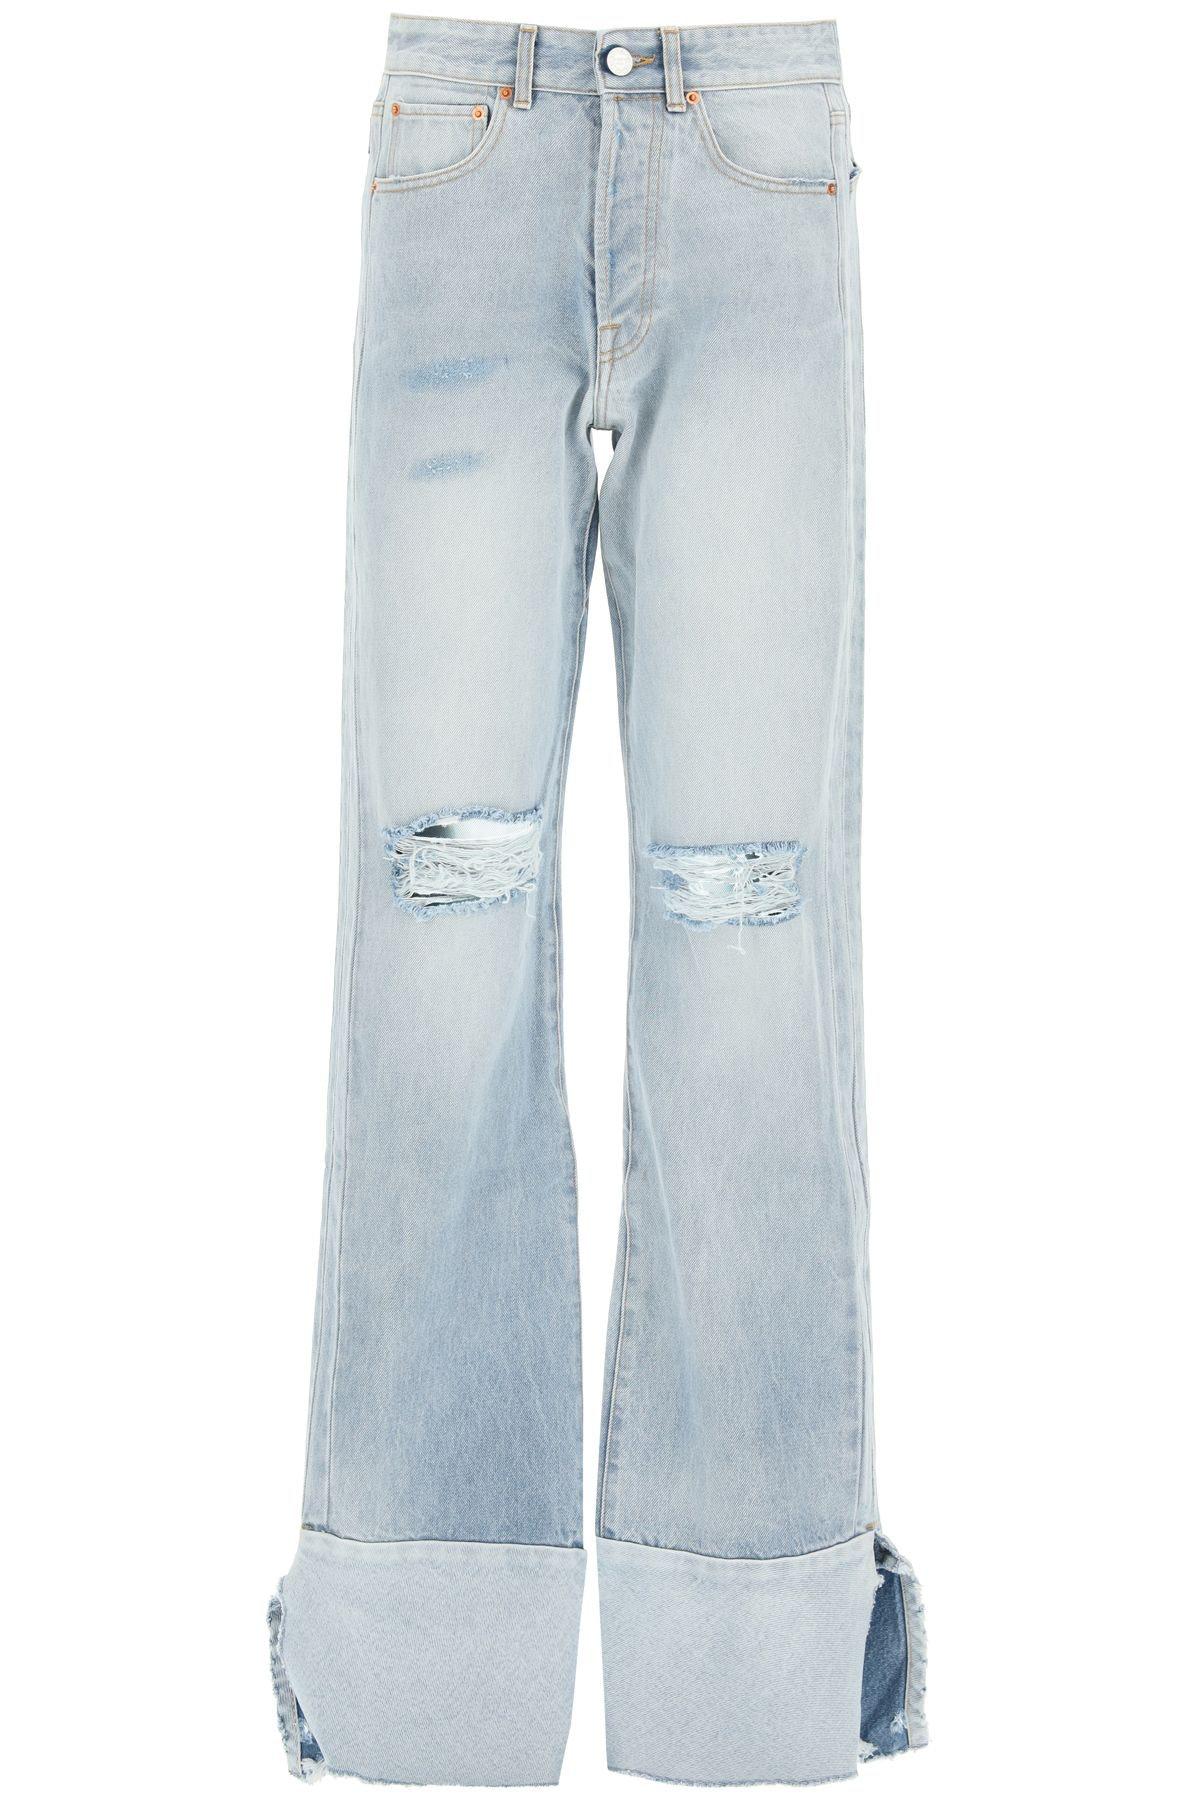 Vetements Wide Leg Destroyed Cut-up Jeans: image 1